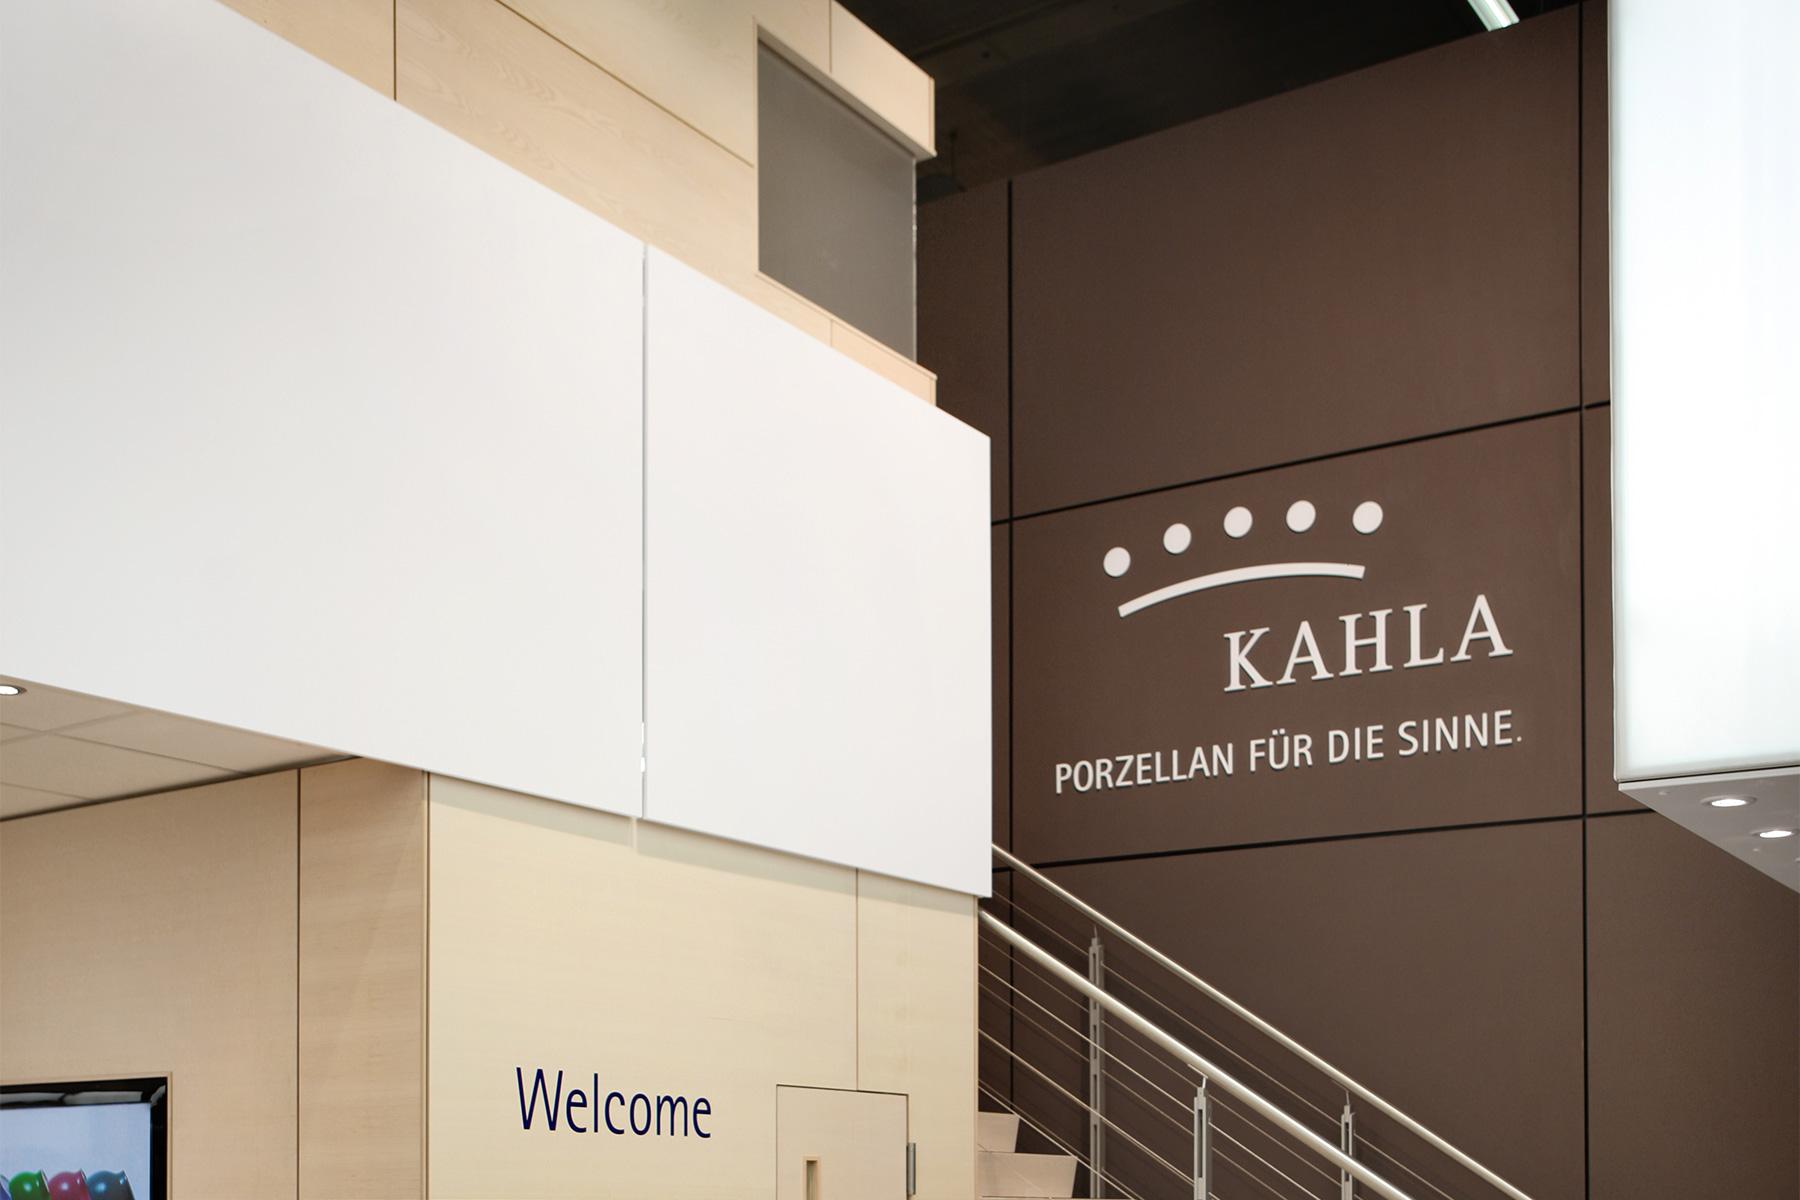 Kahla Porzellan / Markenarchitektur